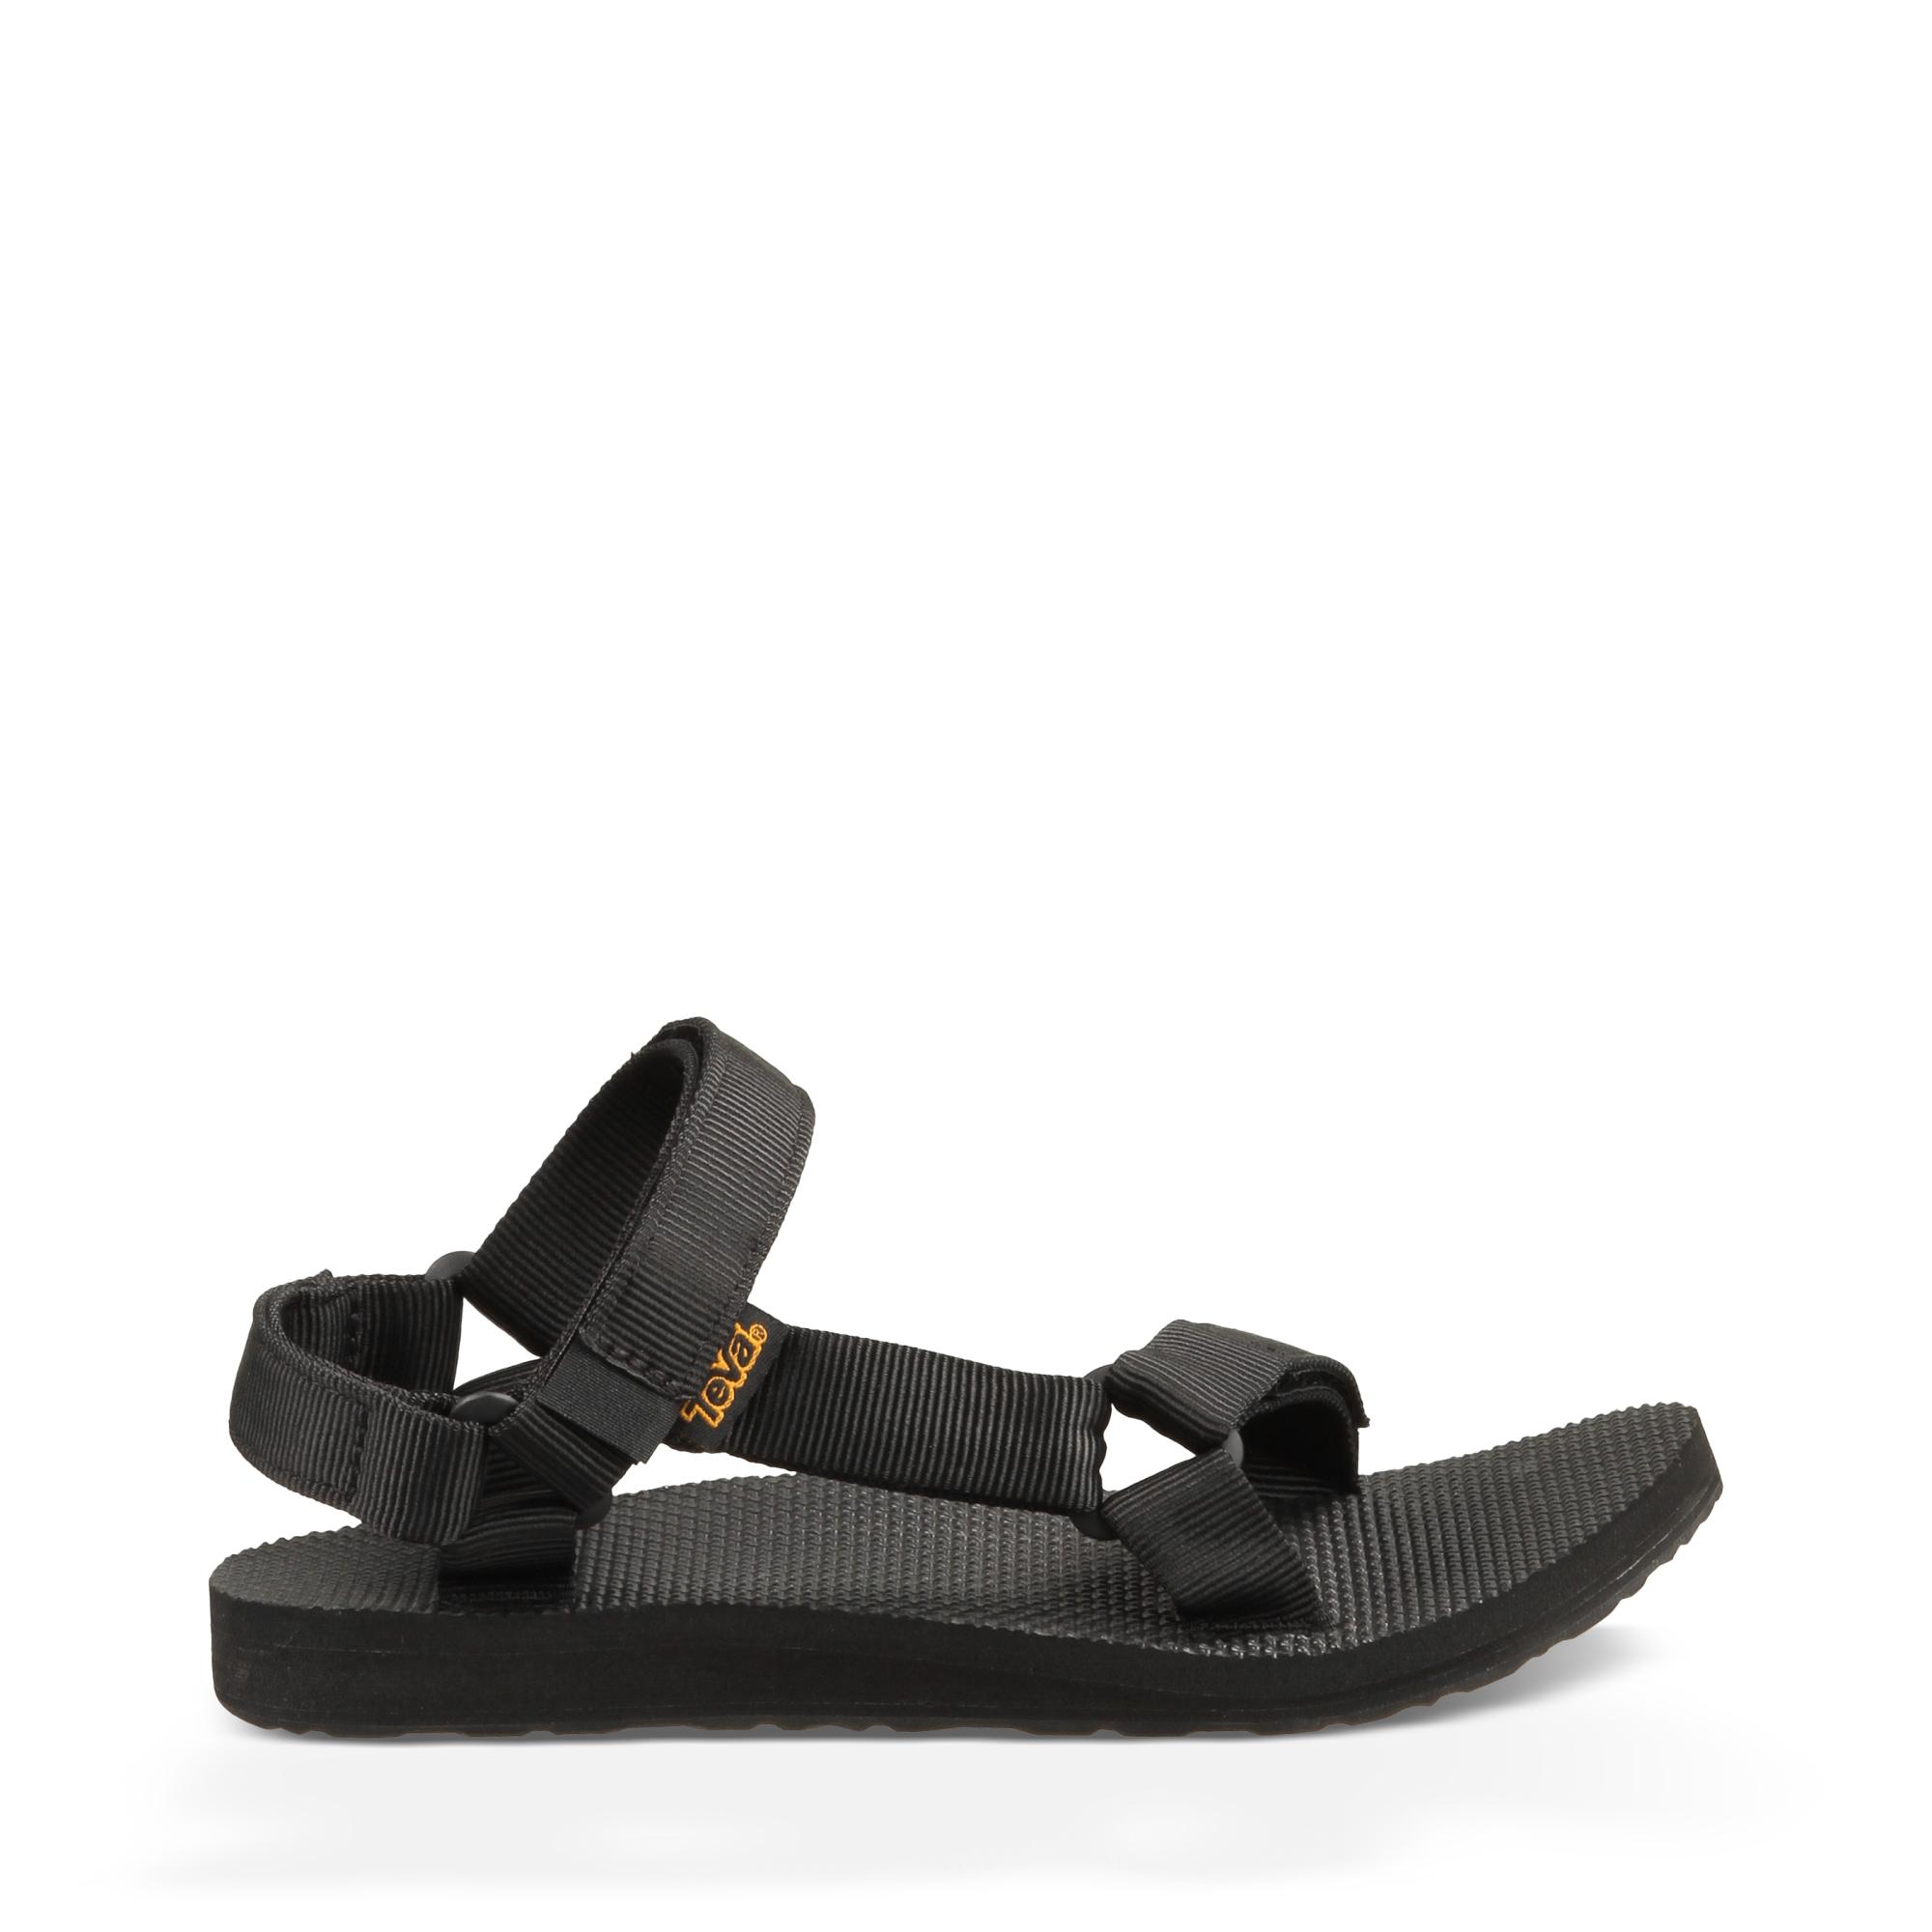 0def9152dfab96 Teva Original Universal Sandals - Women s